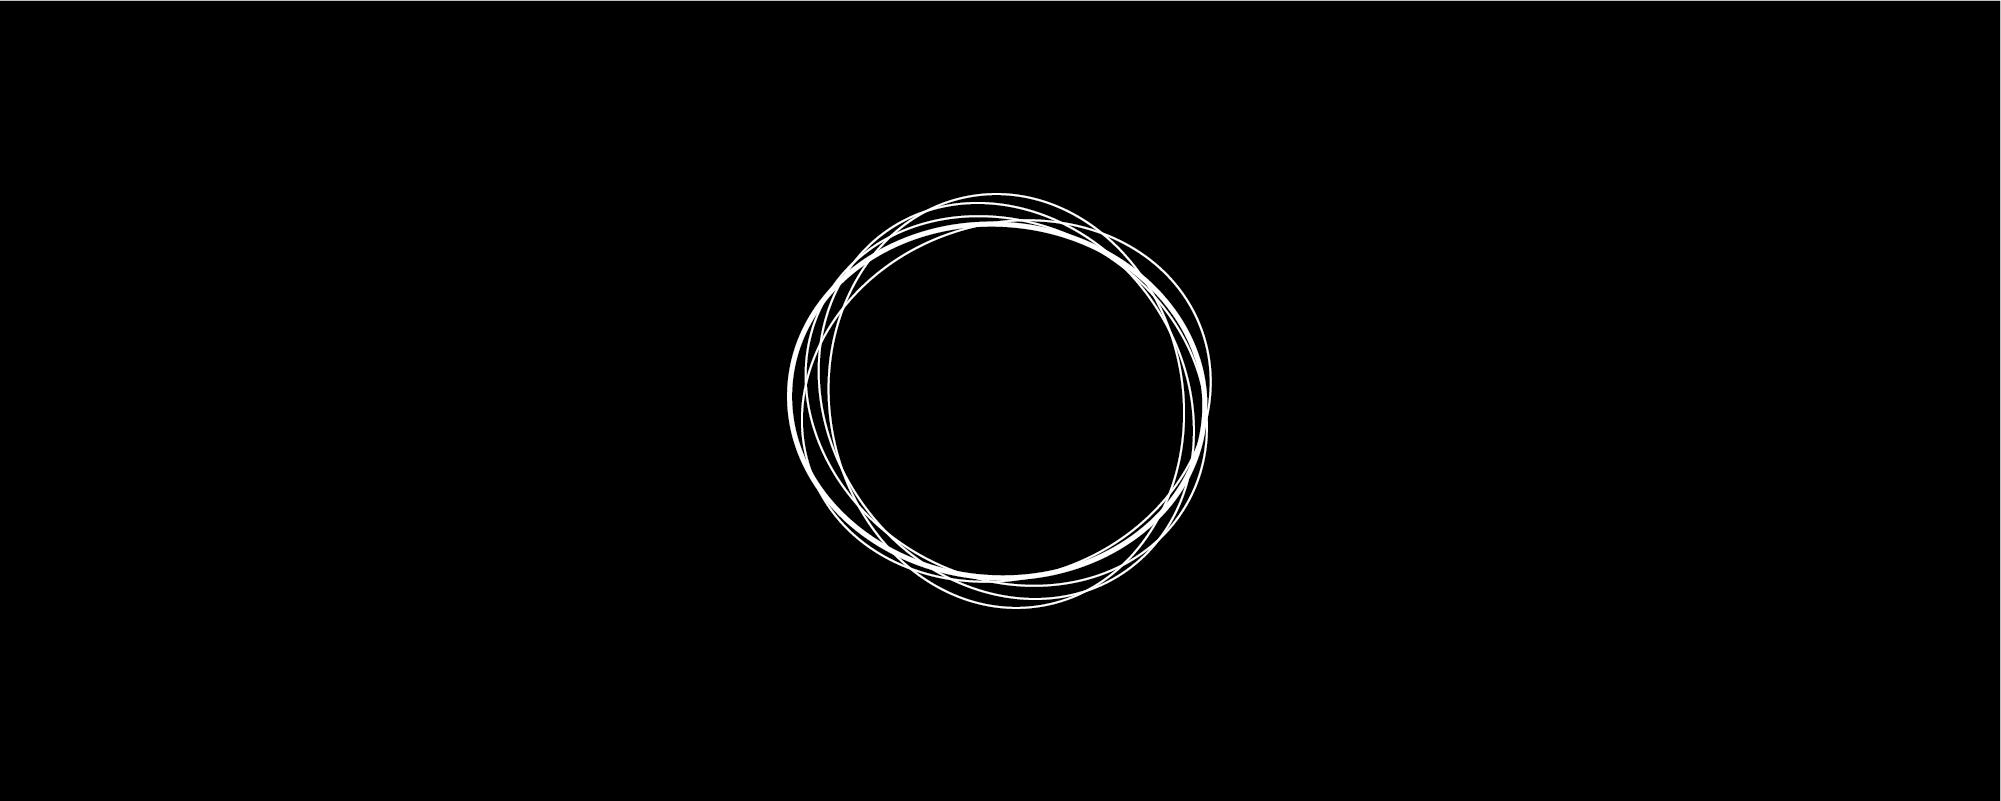 logo-dimitrij-schmunk-final-web-36